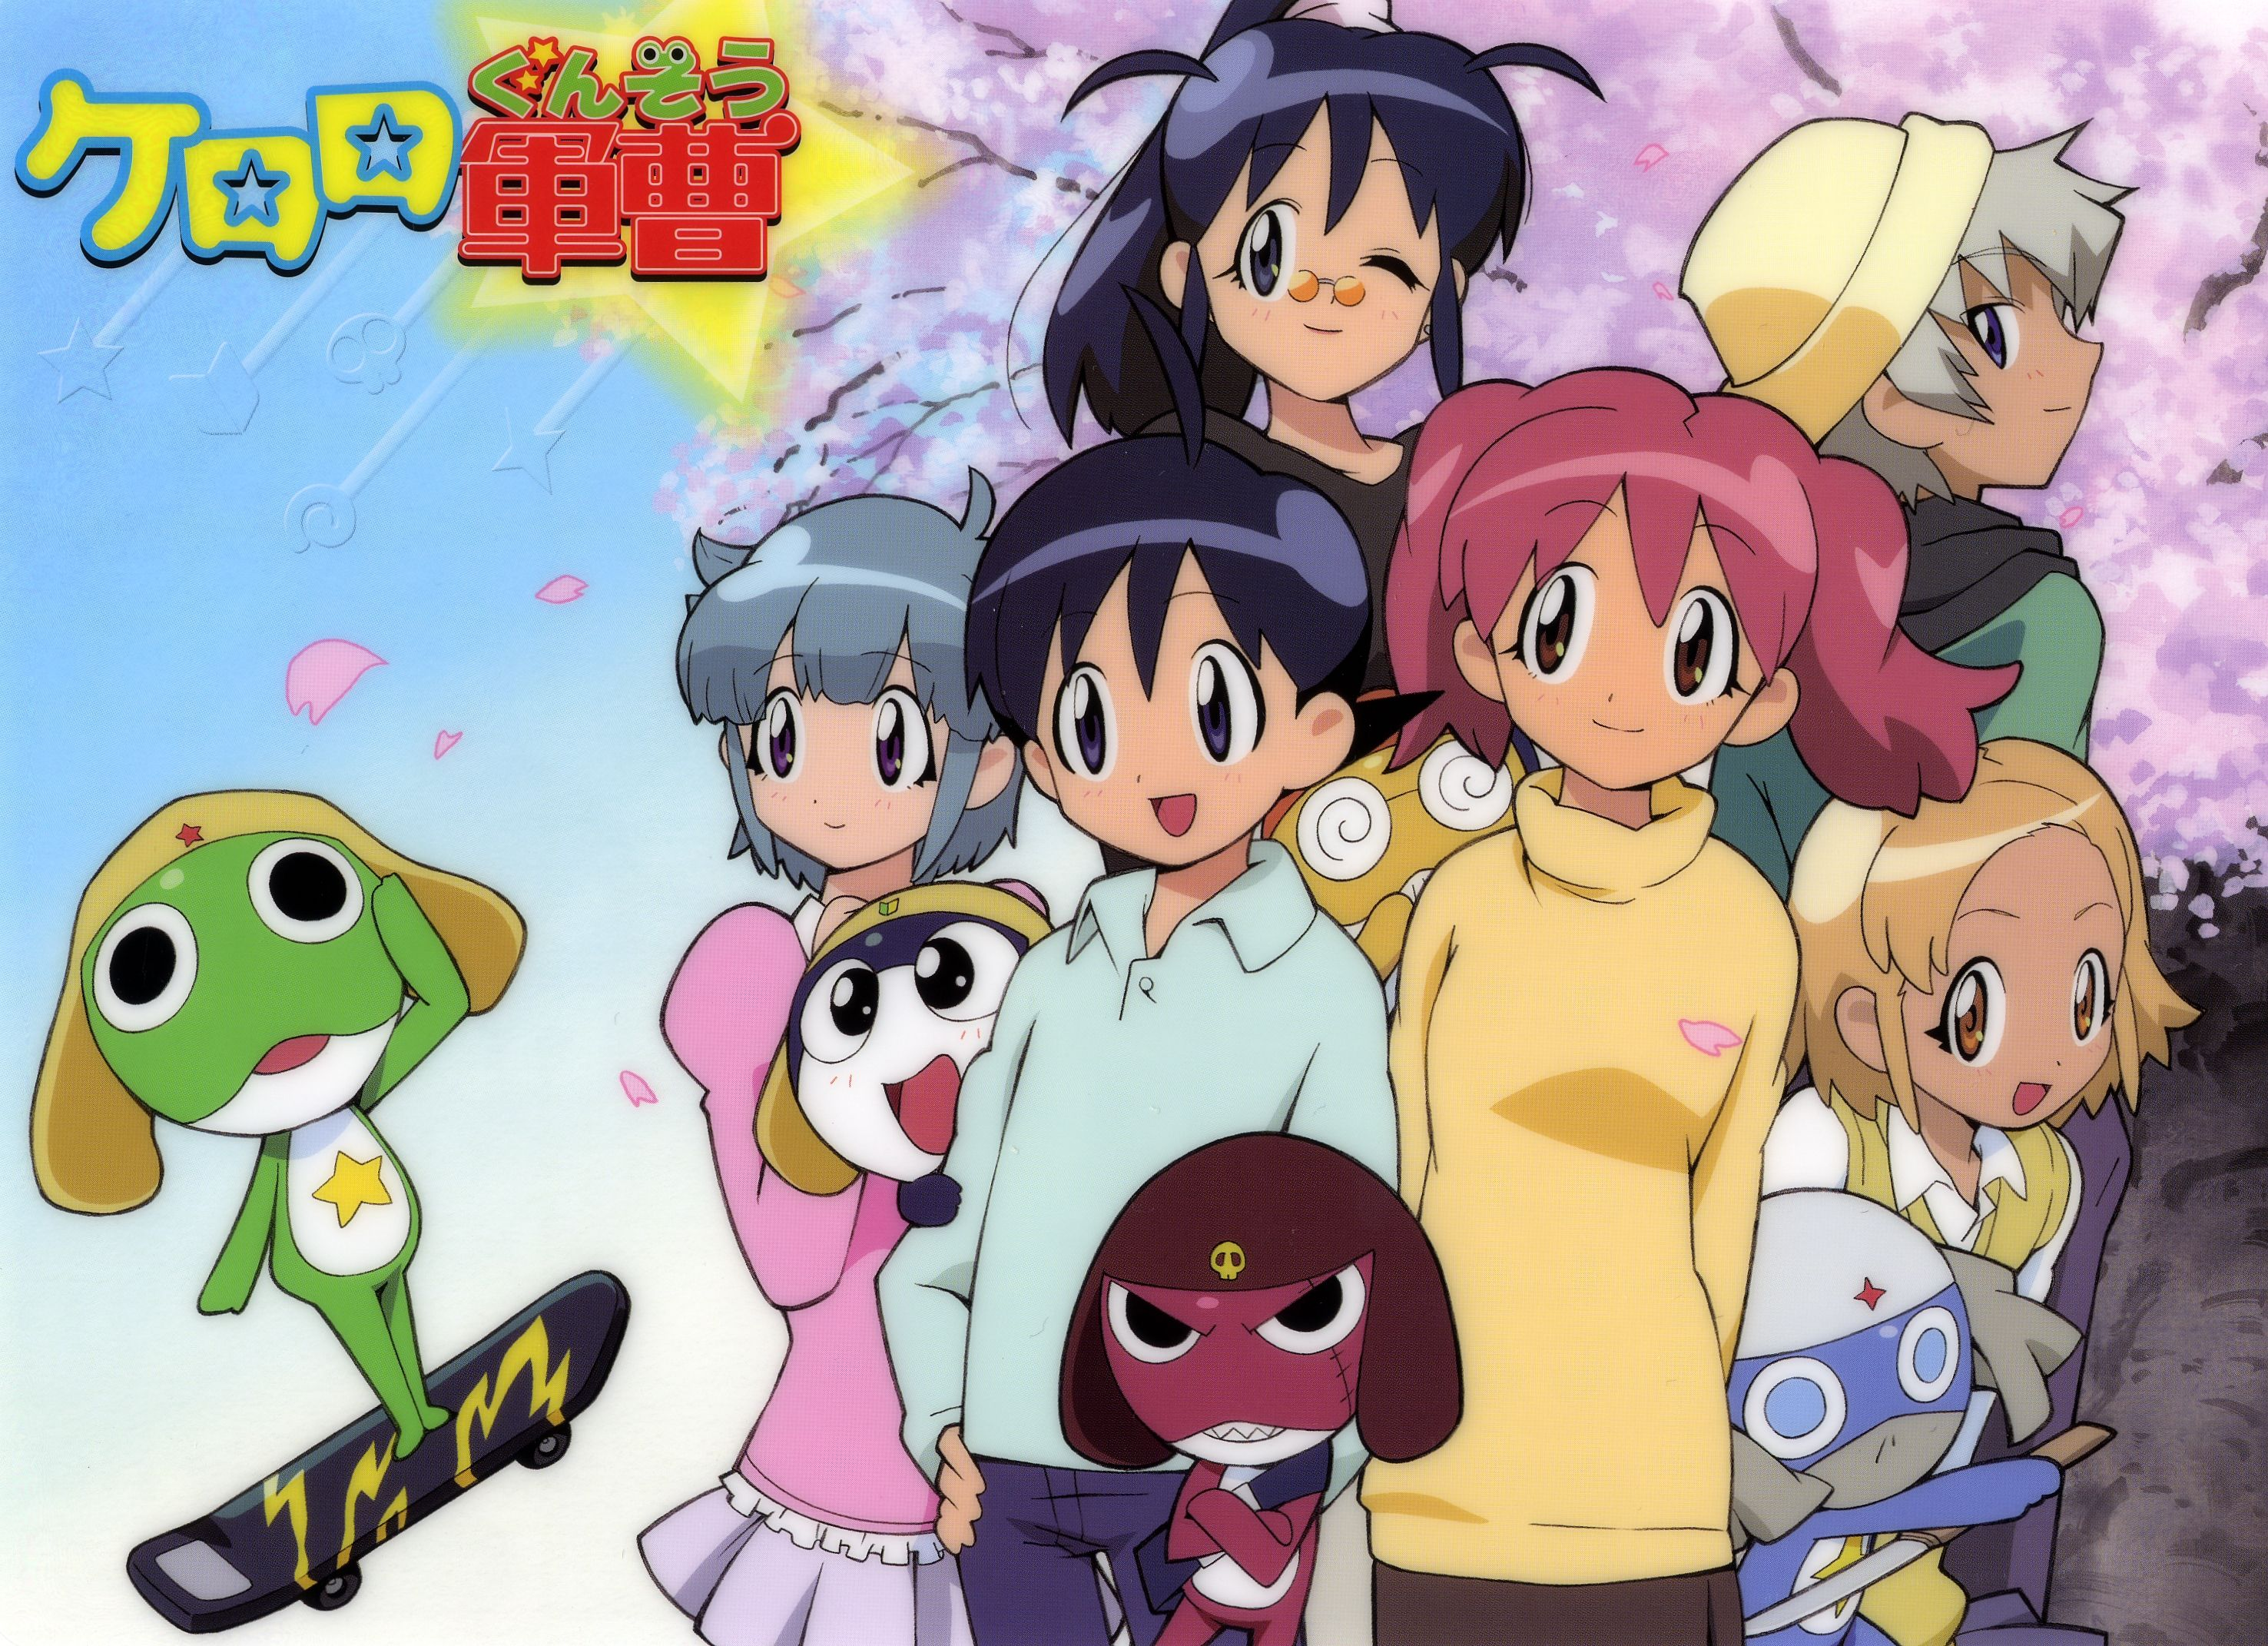 Animax Cartoon Wallpaper keroro gunsou wallpapers, anime, hq keroro gunsou pictures